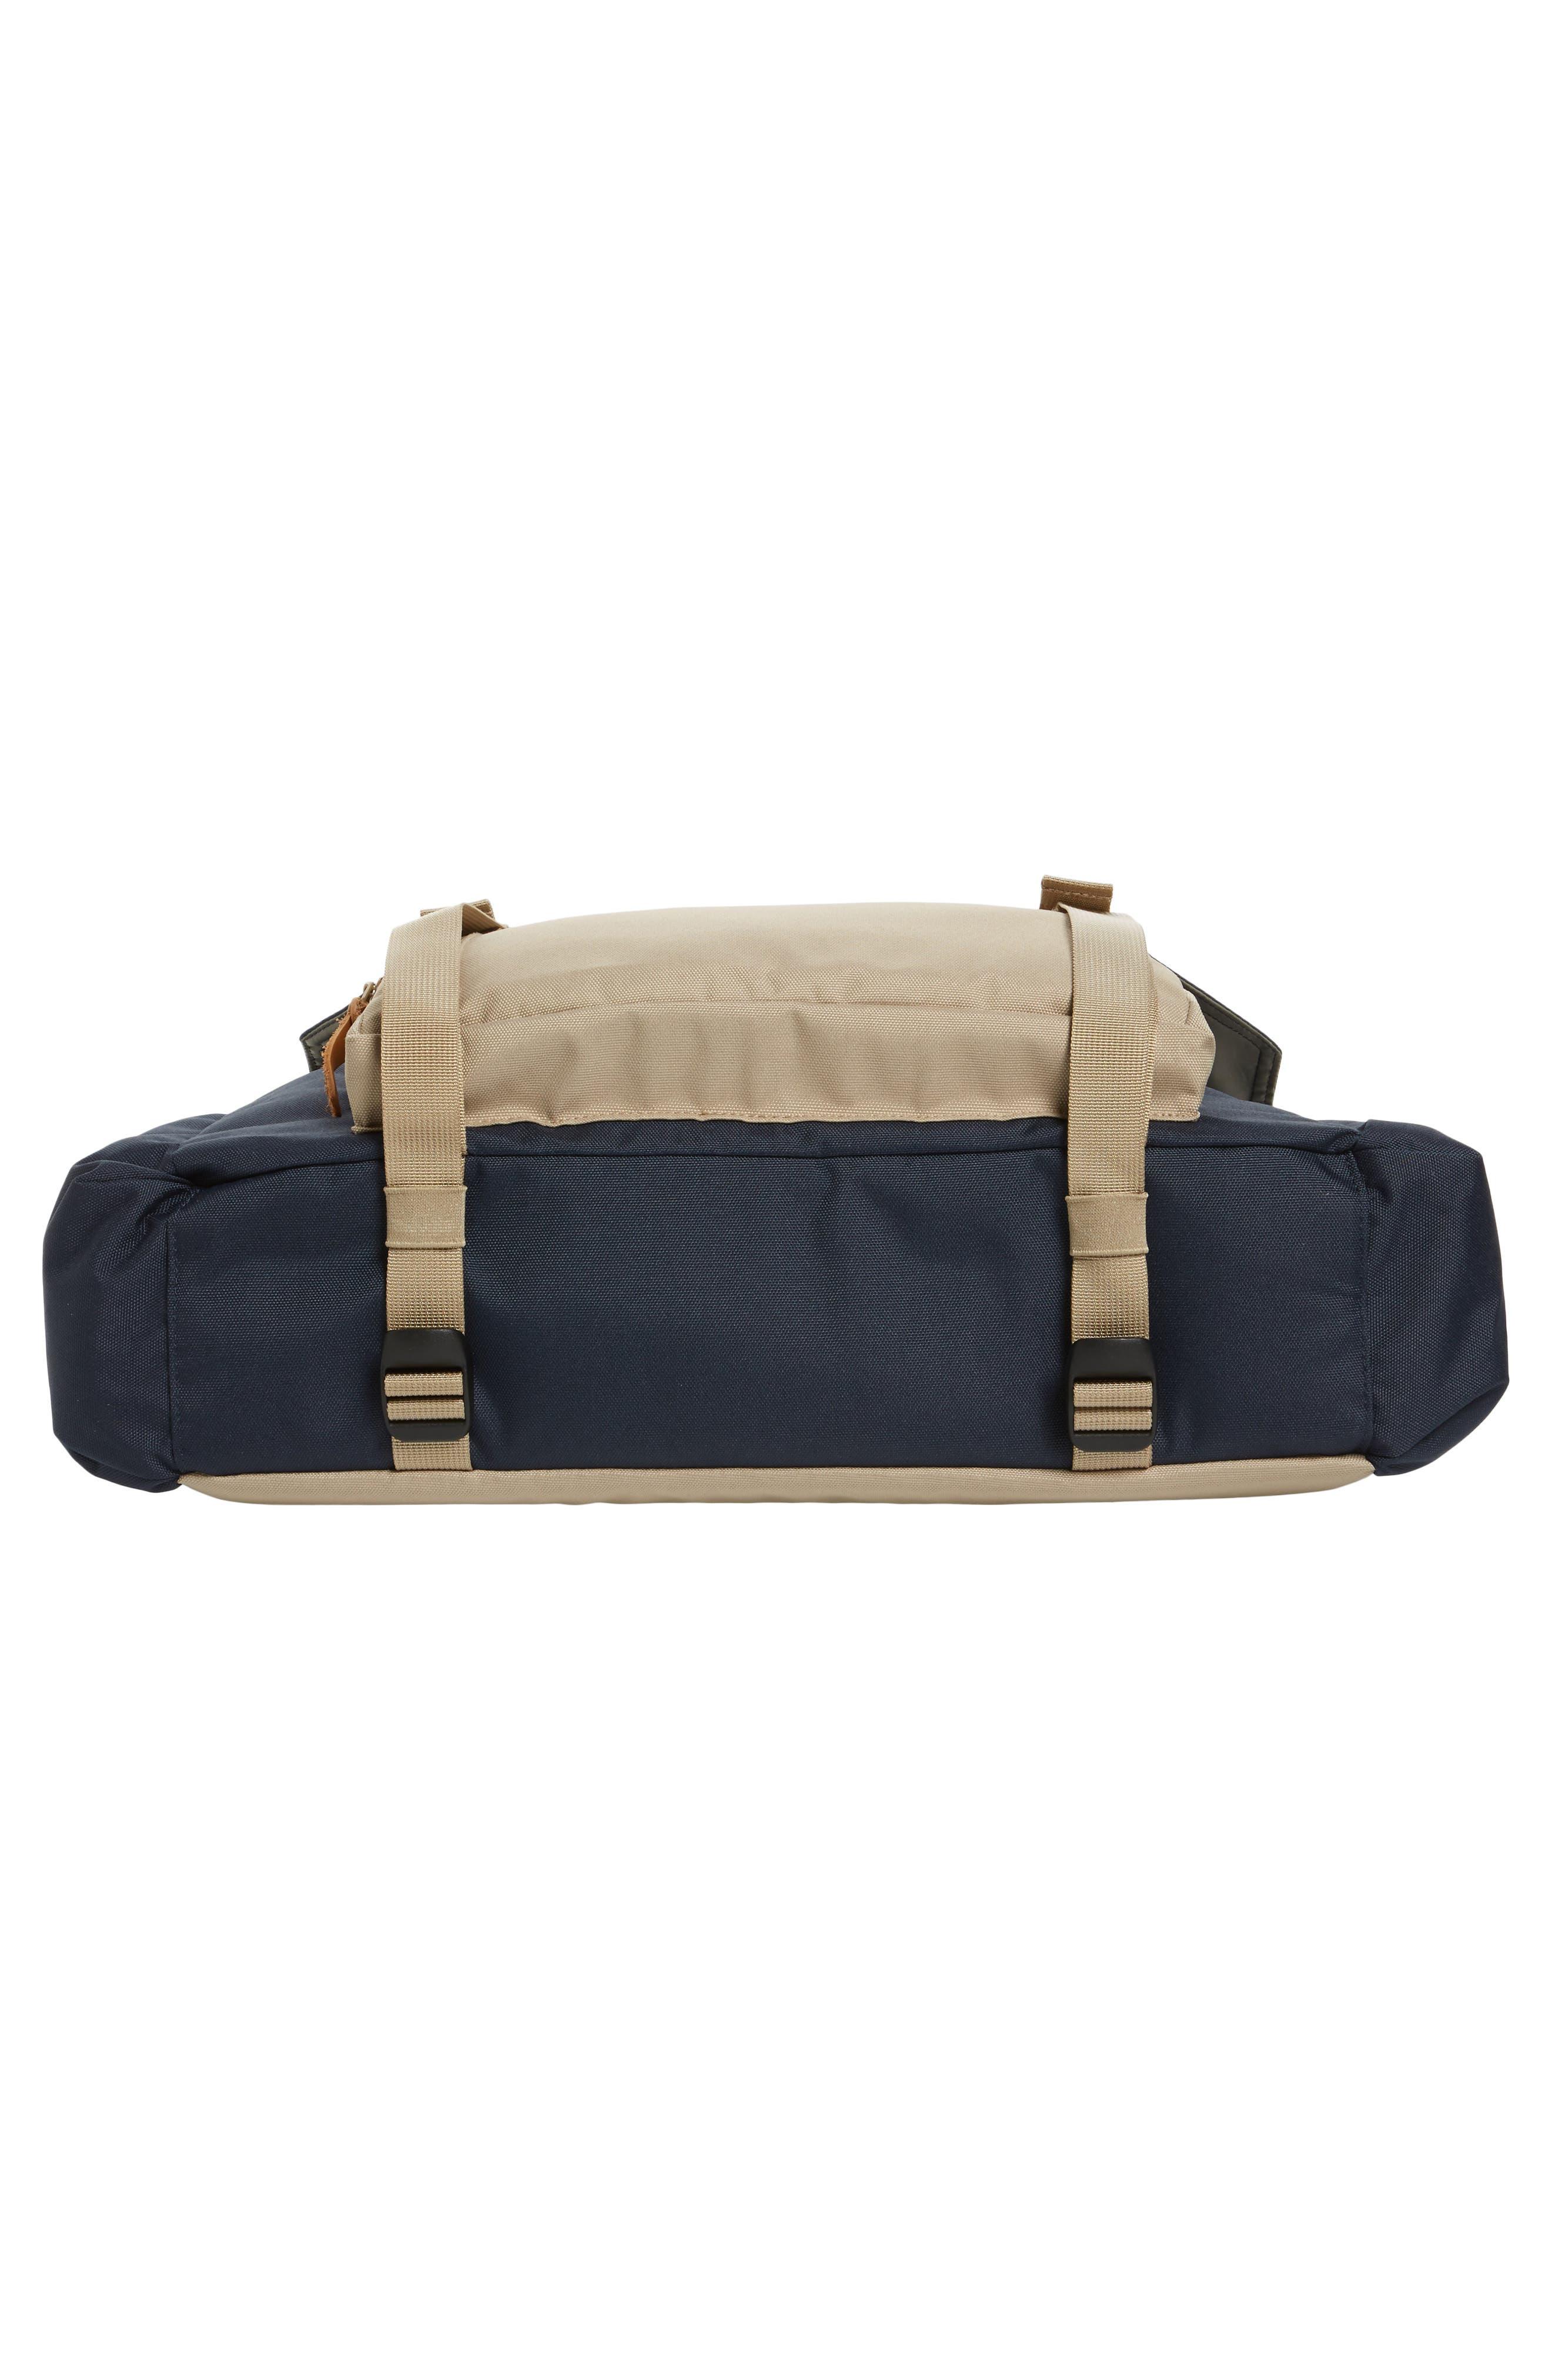 Crossridge Messenger Bag,                             Alternate thumbnail 6, color,                             Navy/ Tan